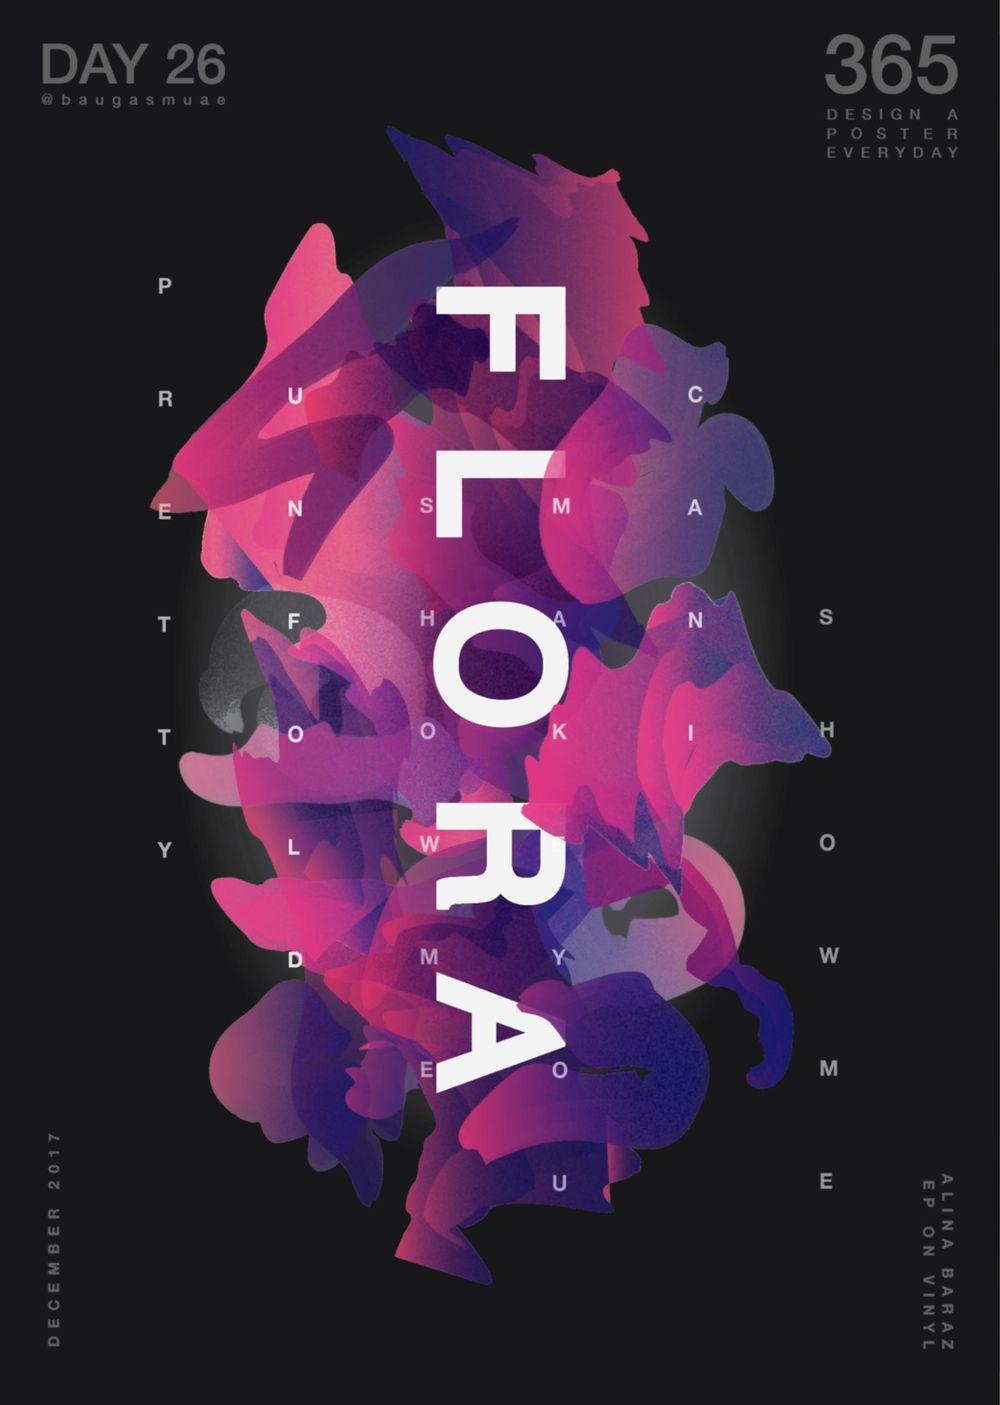 FLORA Album Poster - image 1 - student project